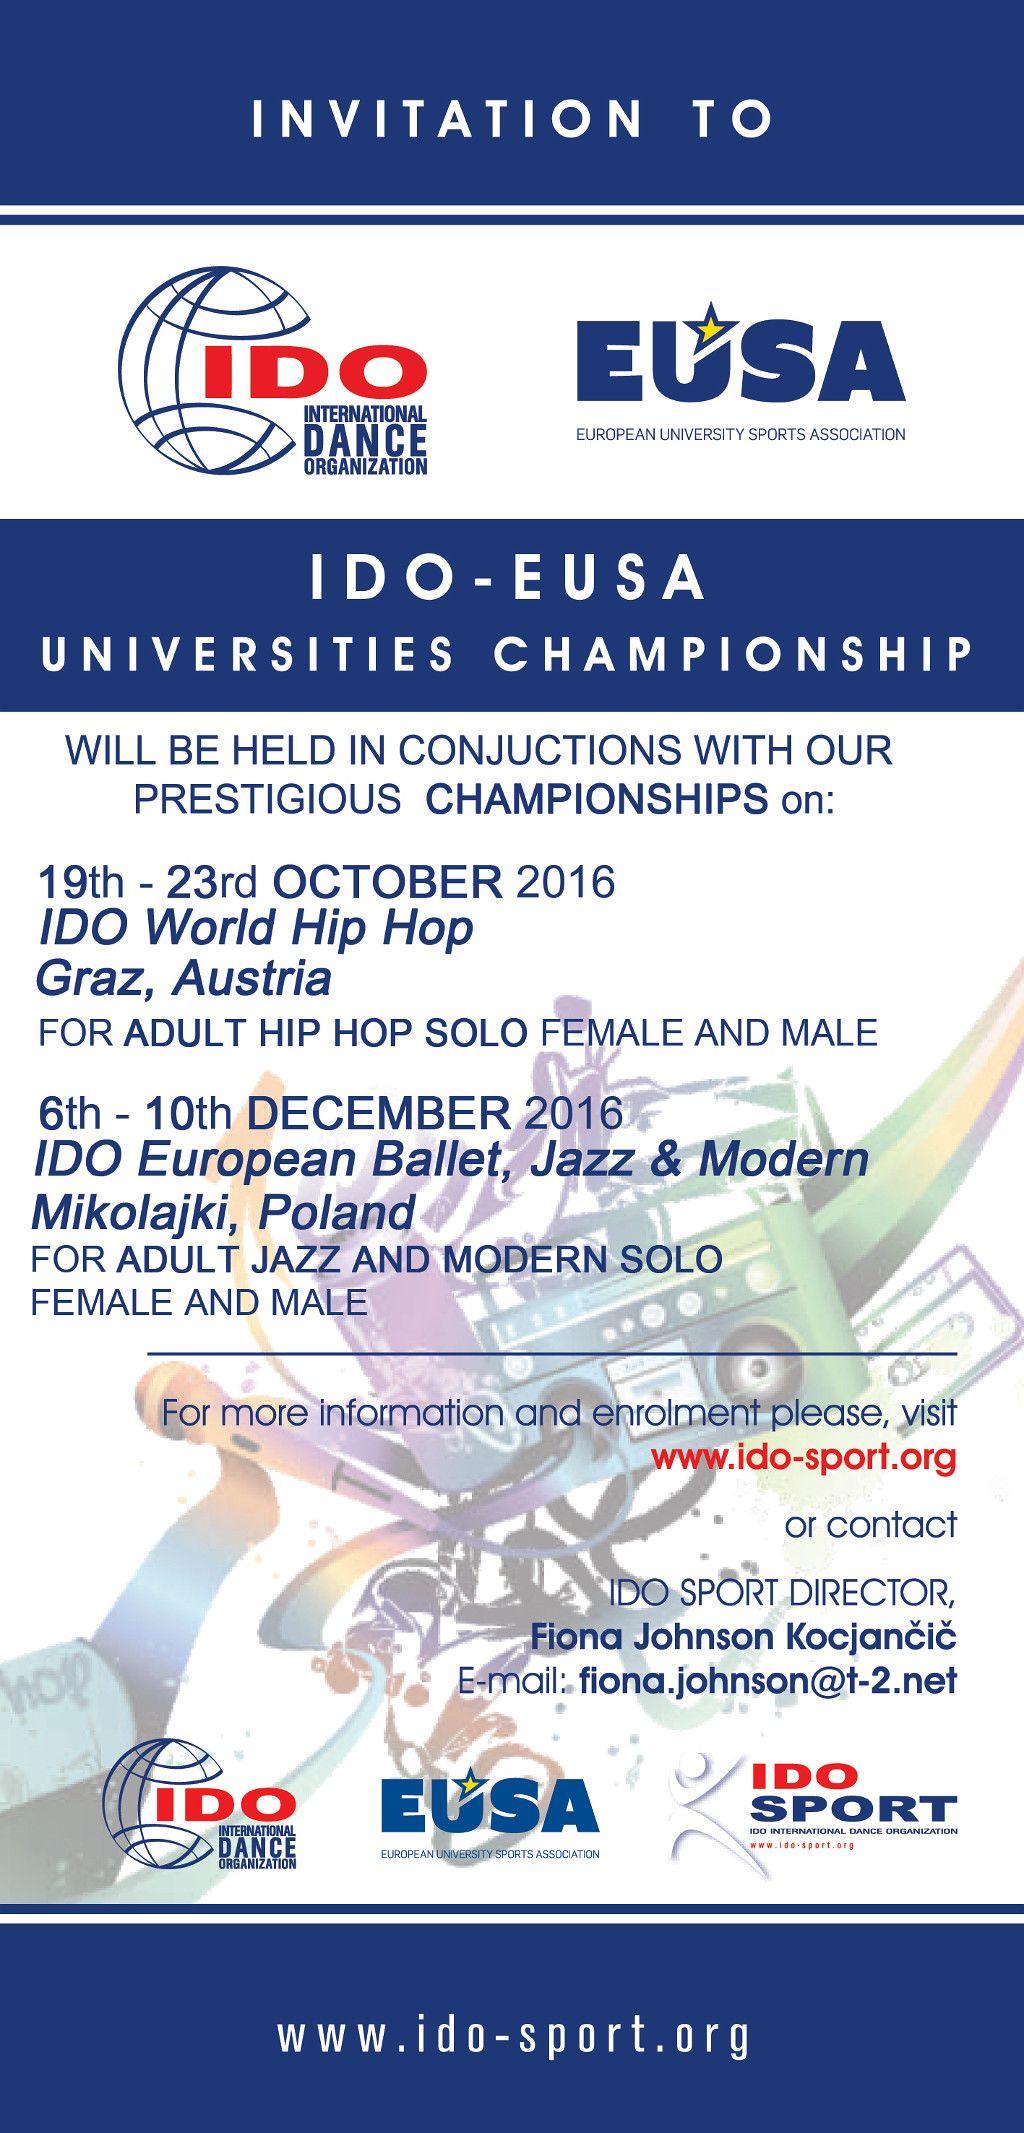 EUSA-IDO Championships 2016